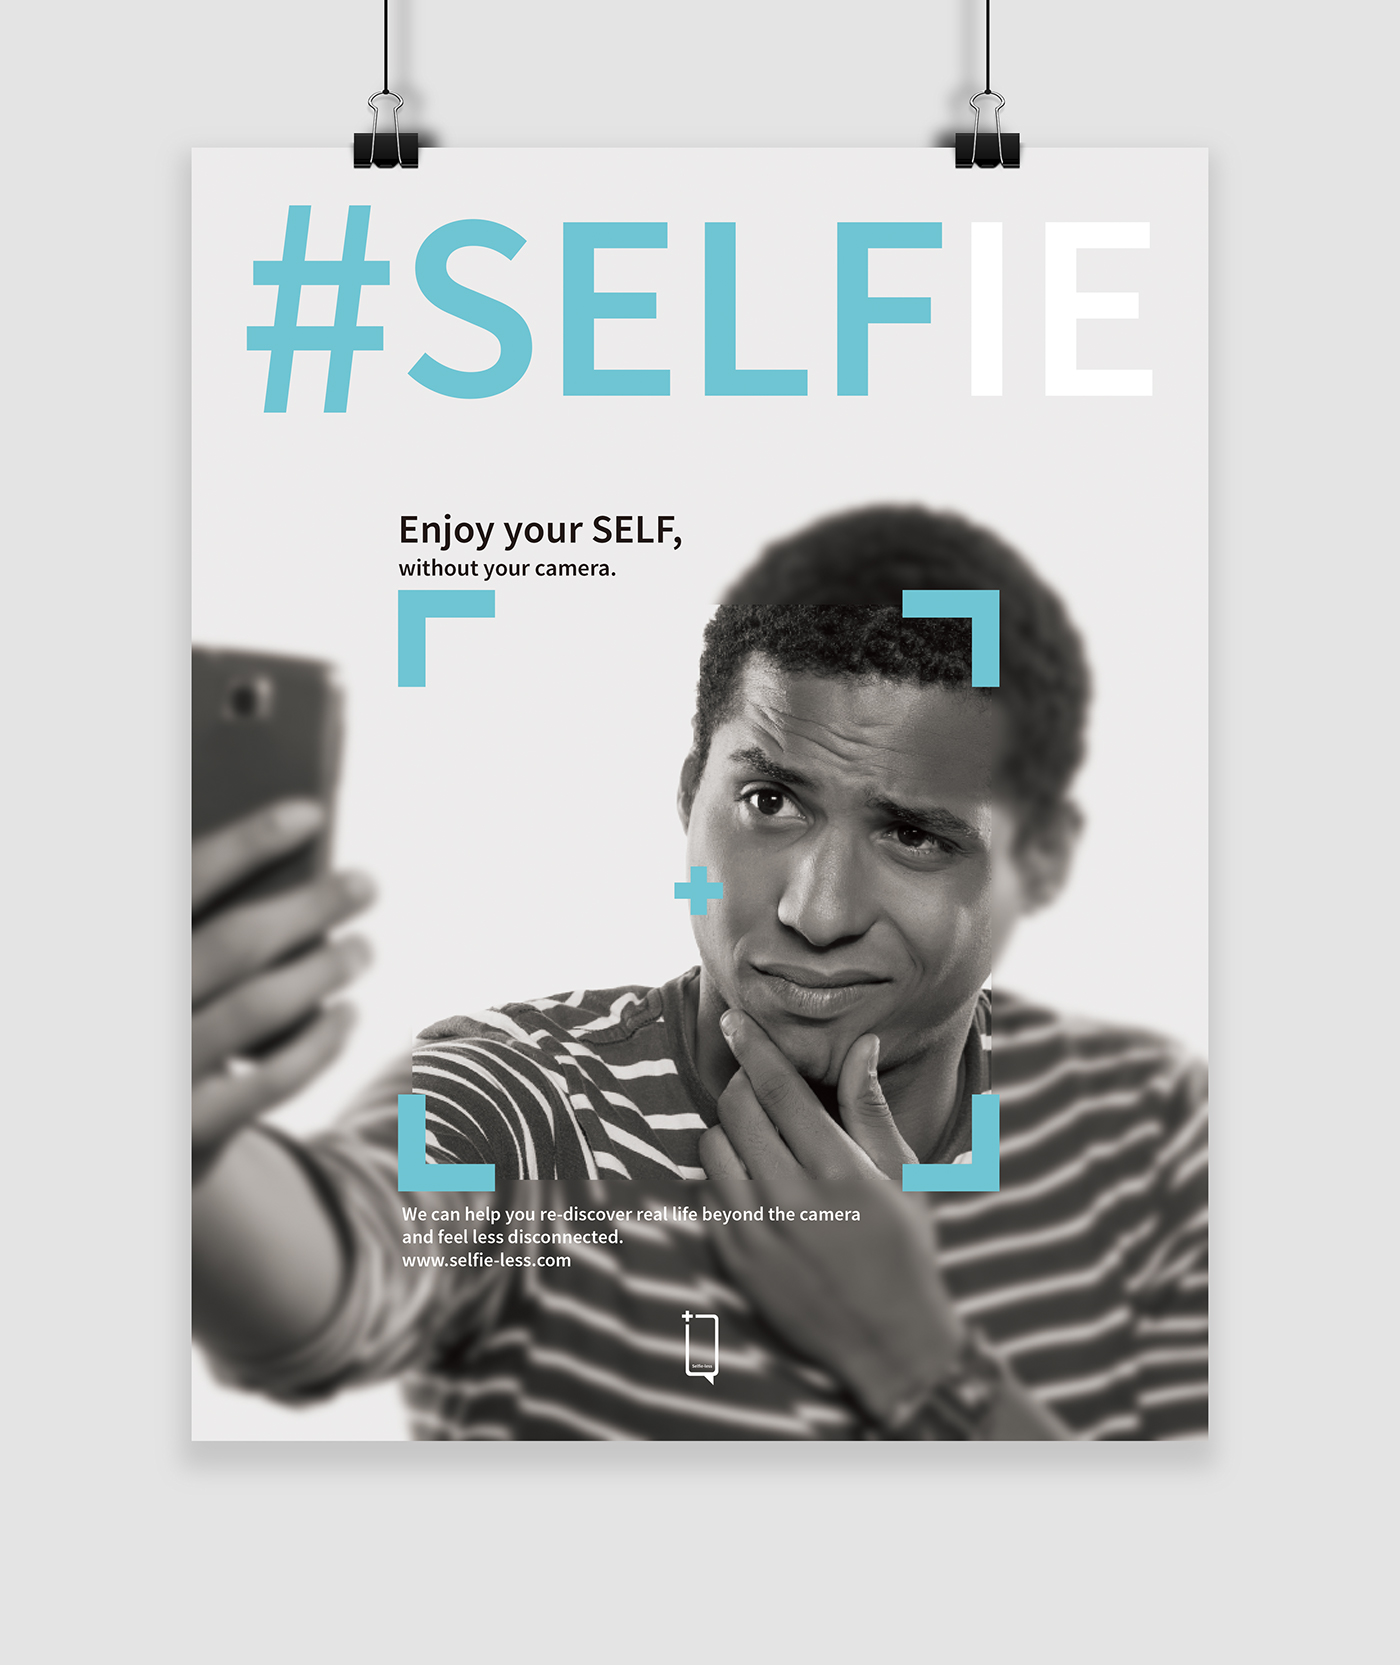 branding  selfie hashtag typography   logo Event foodtruck graphicdesign Poster series adobeawards